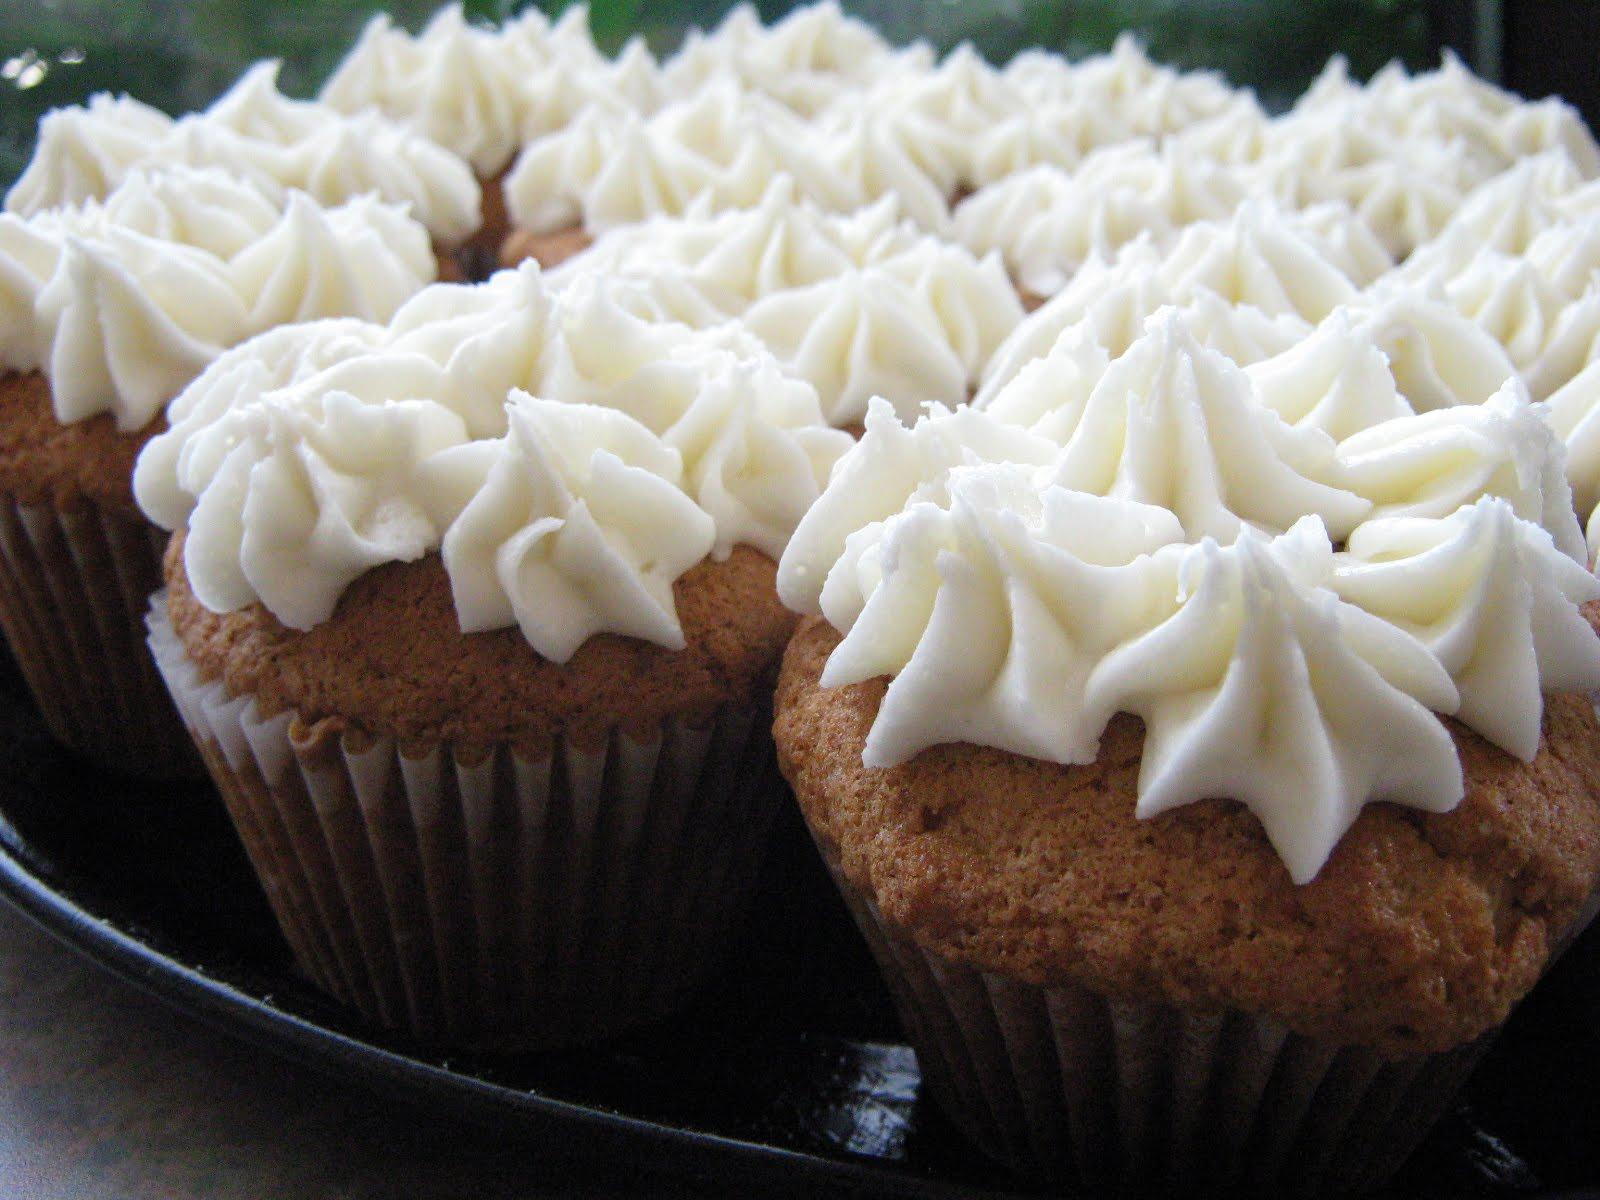 les douceurs de genny cupcakes la cardamome gla age vanille. Black Bedroom Furniture Sets. Home Design Ideas